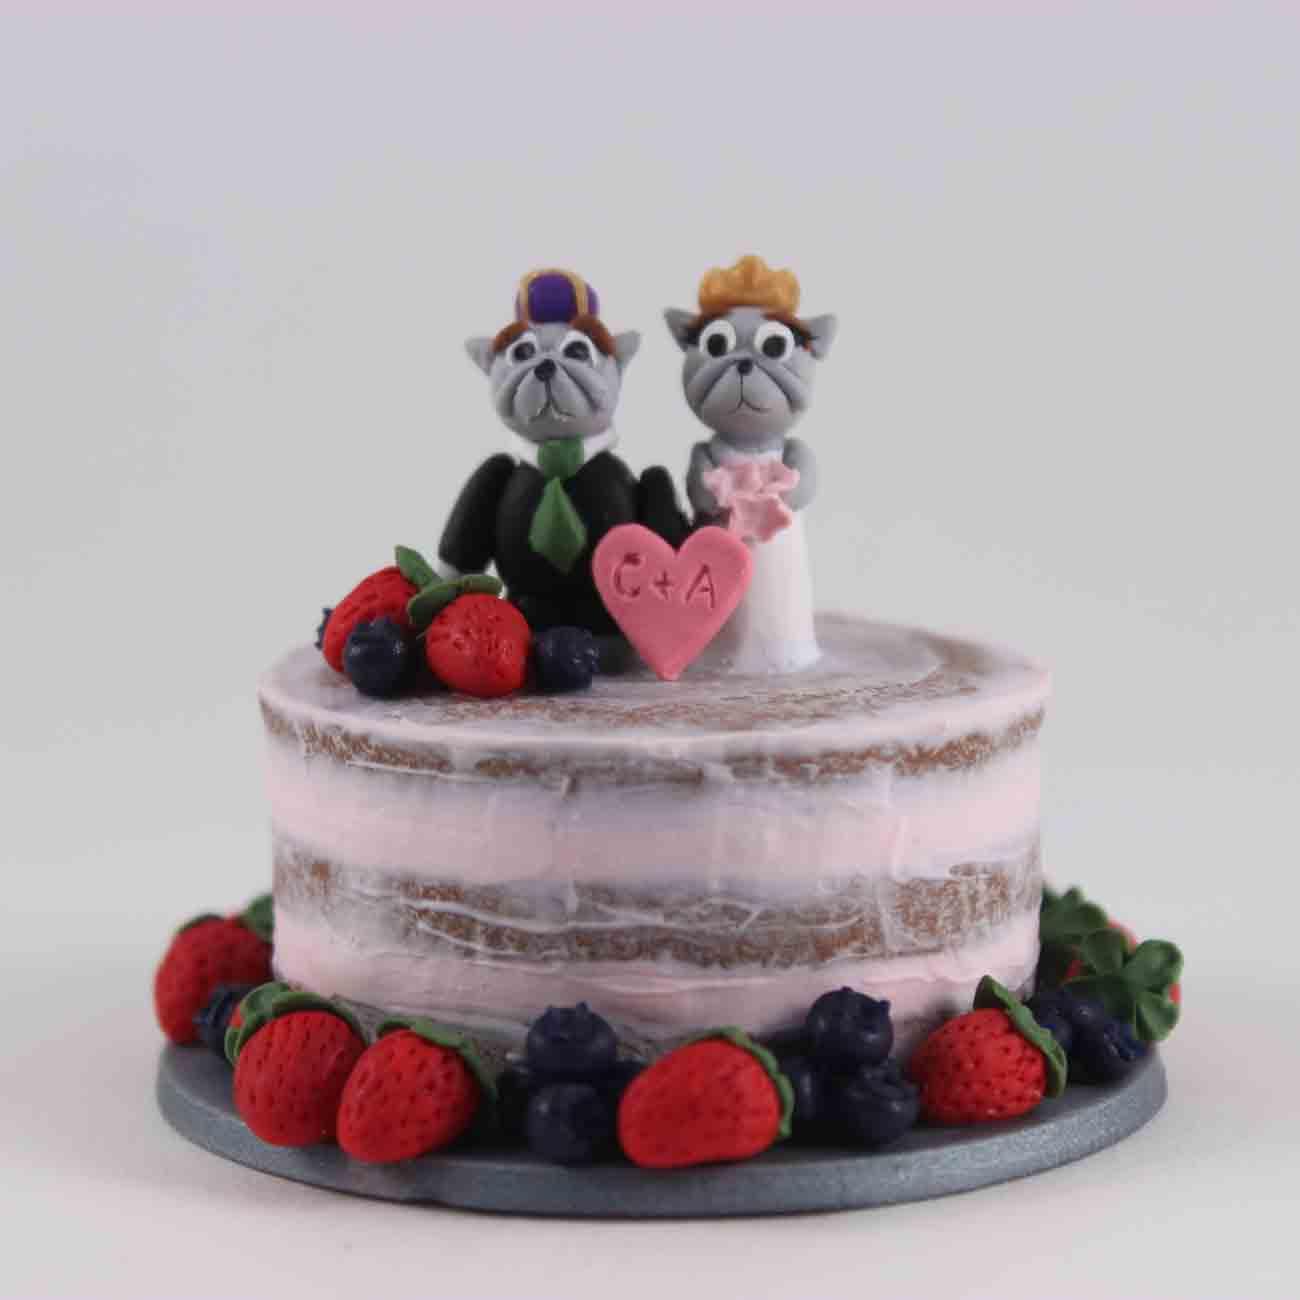 mini wedding cake with mascott cake topper.jpg